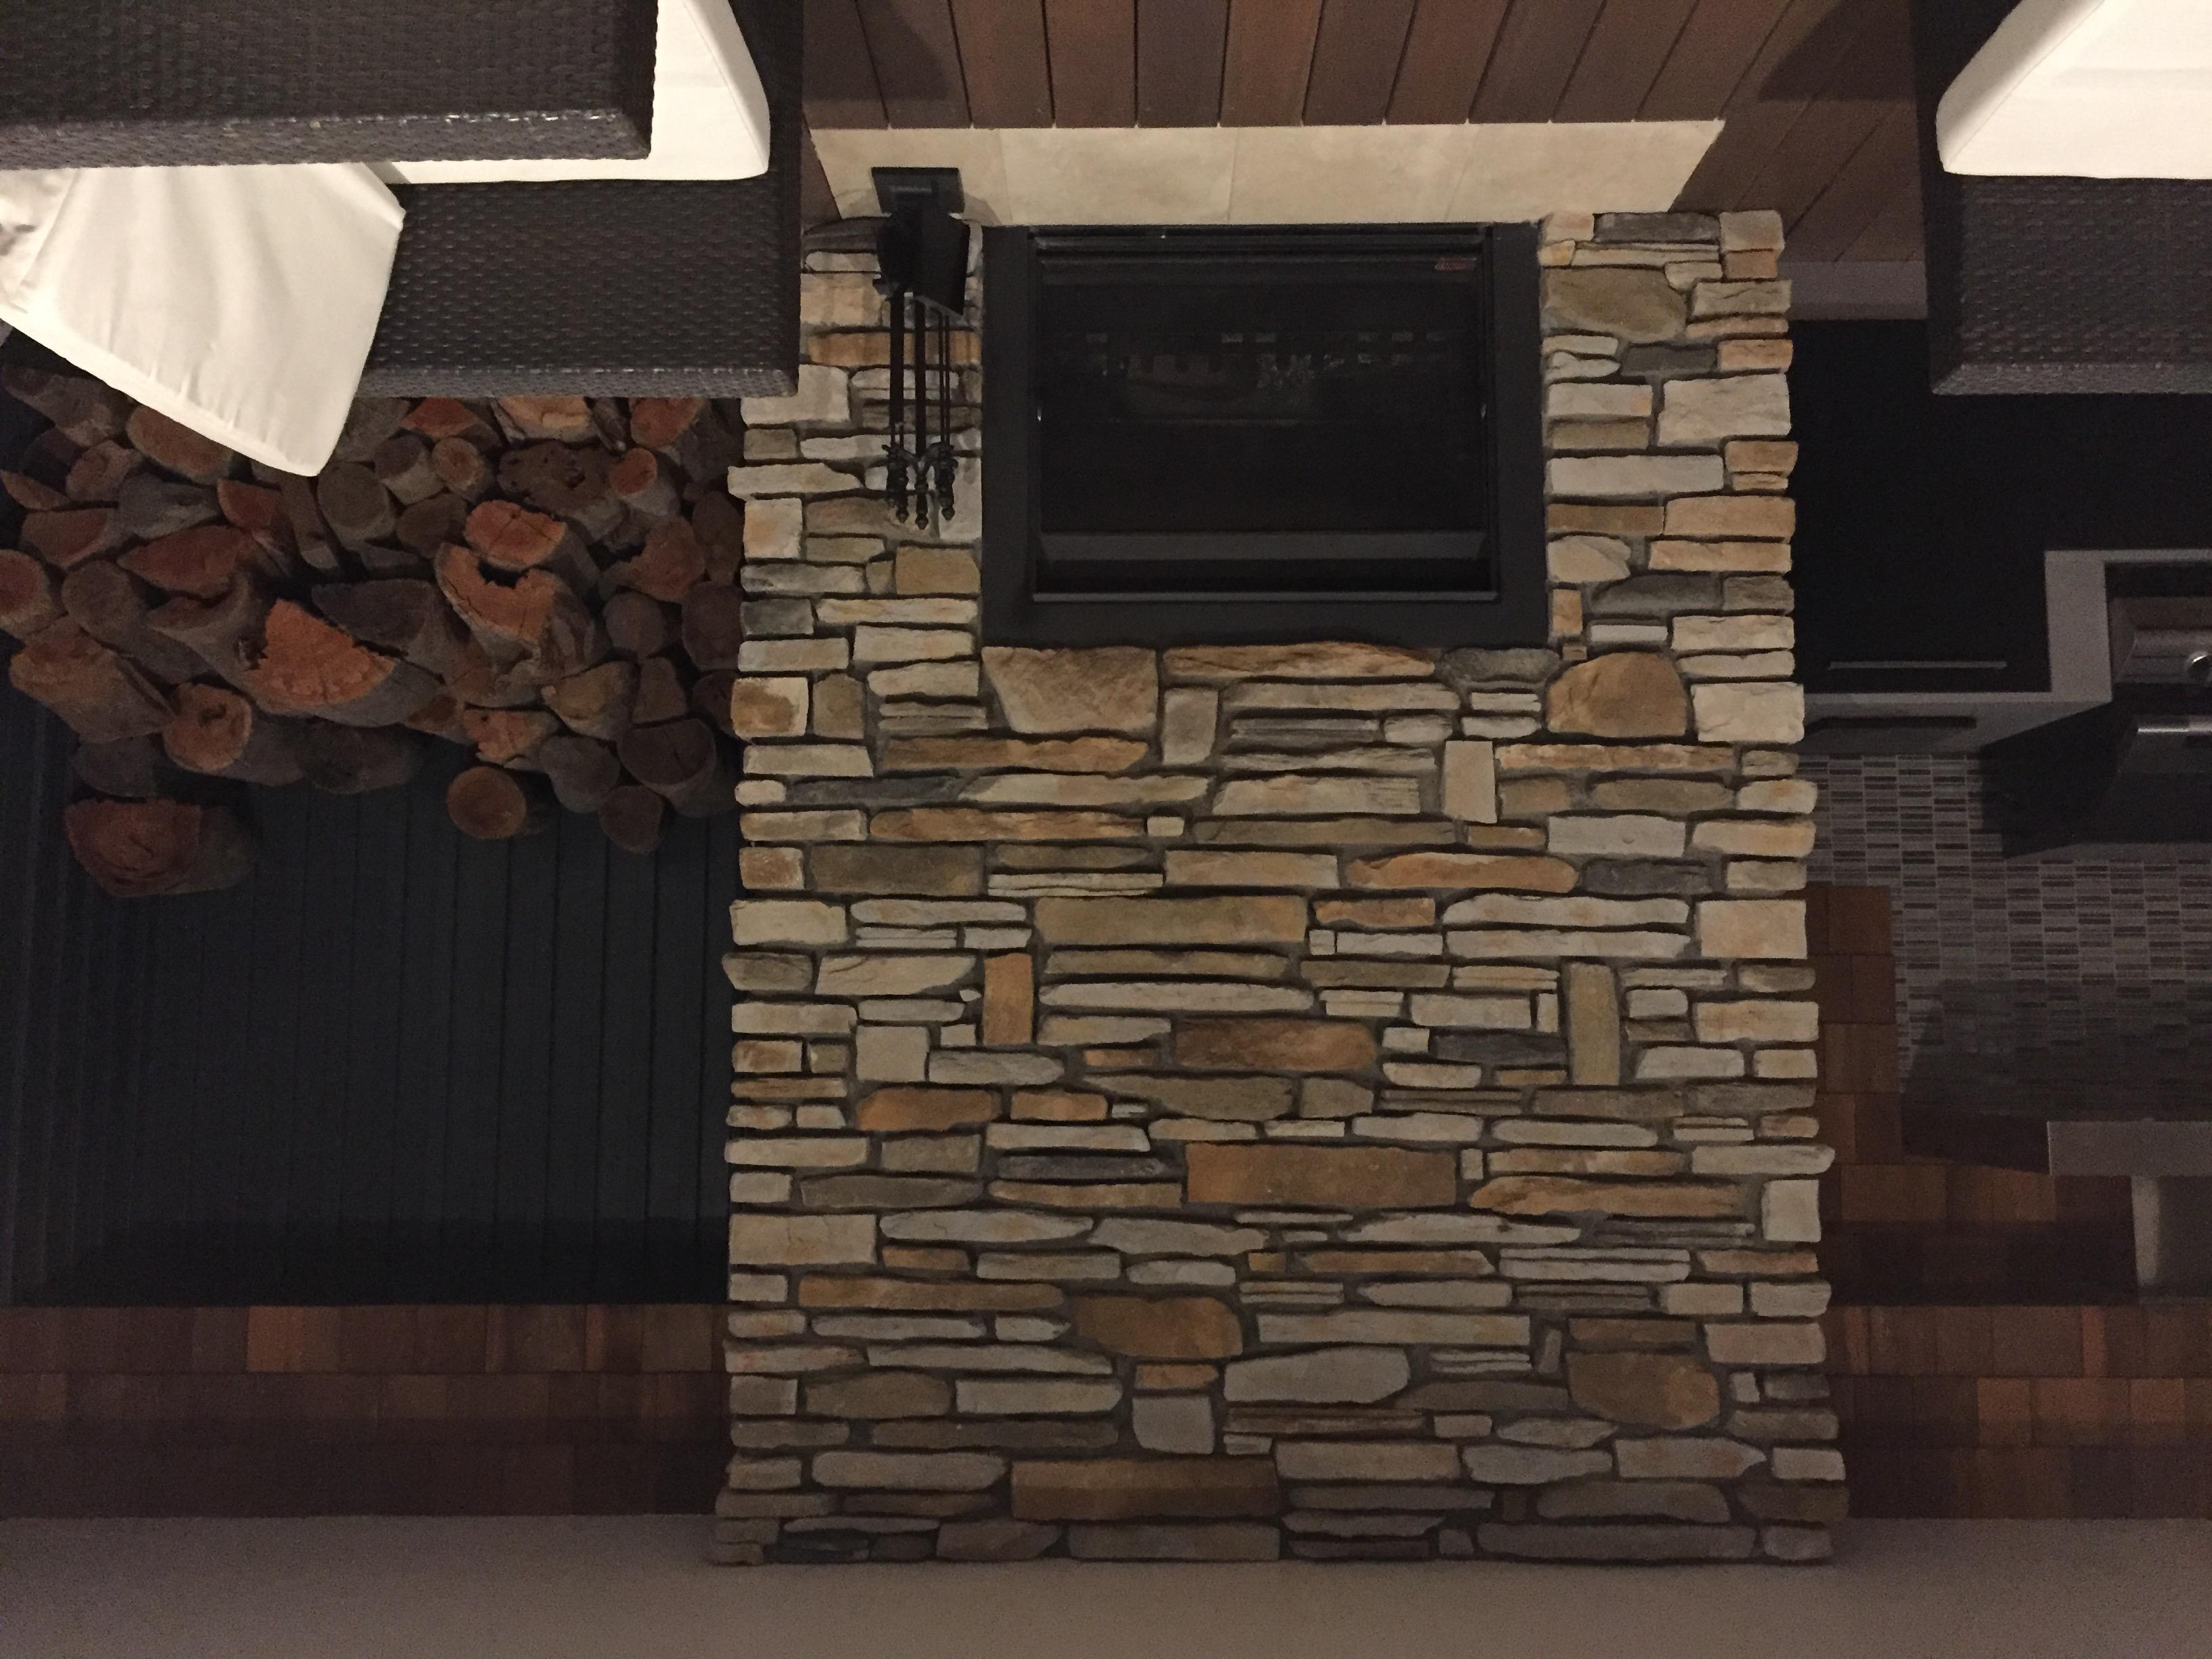 Southern ledgestone Aspen Fireplace 2